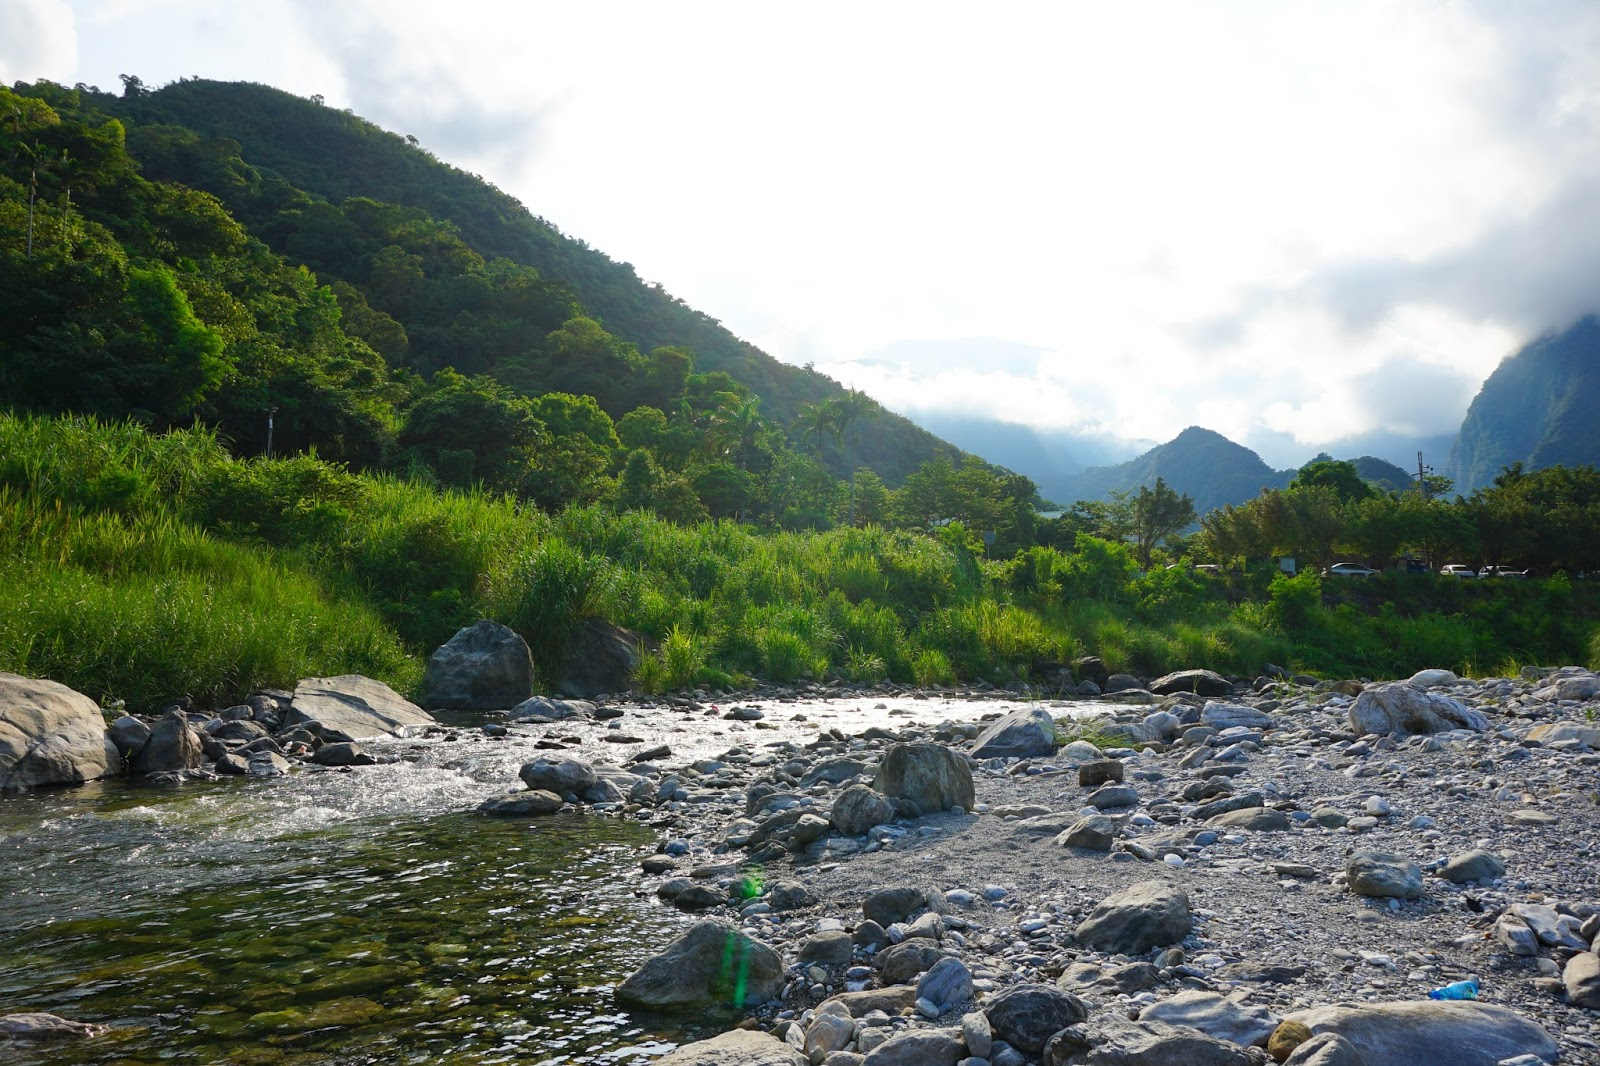 4-%25E6%259C%25AA%25E5%2591%25BD%25E5%2590%258D-IMG_2023-beautyanxiety.com-hualien-travel-sanzhan-river